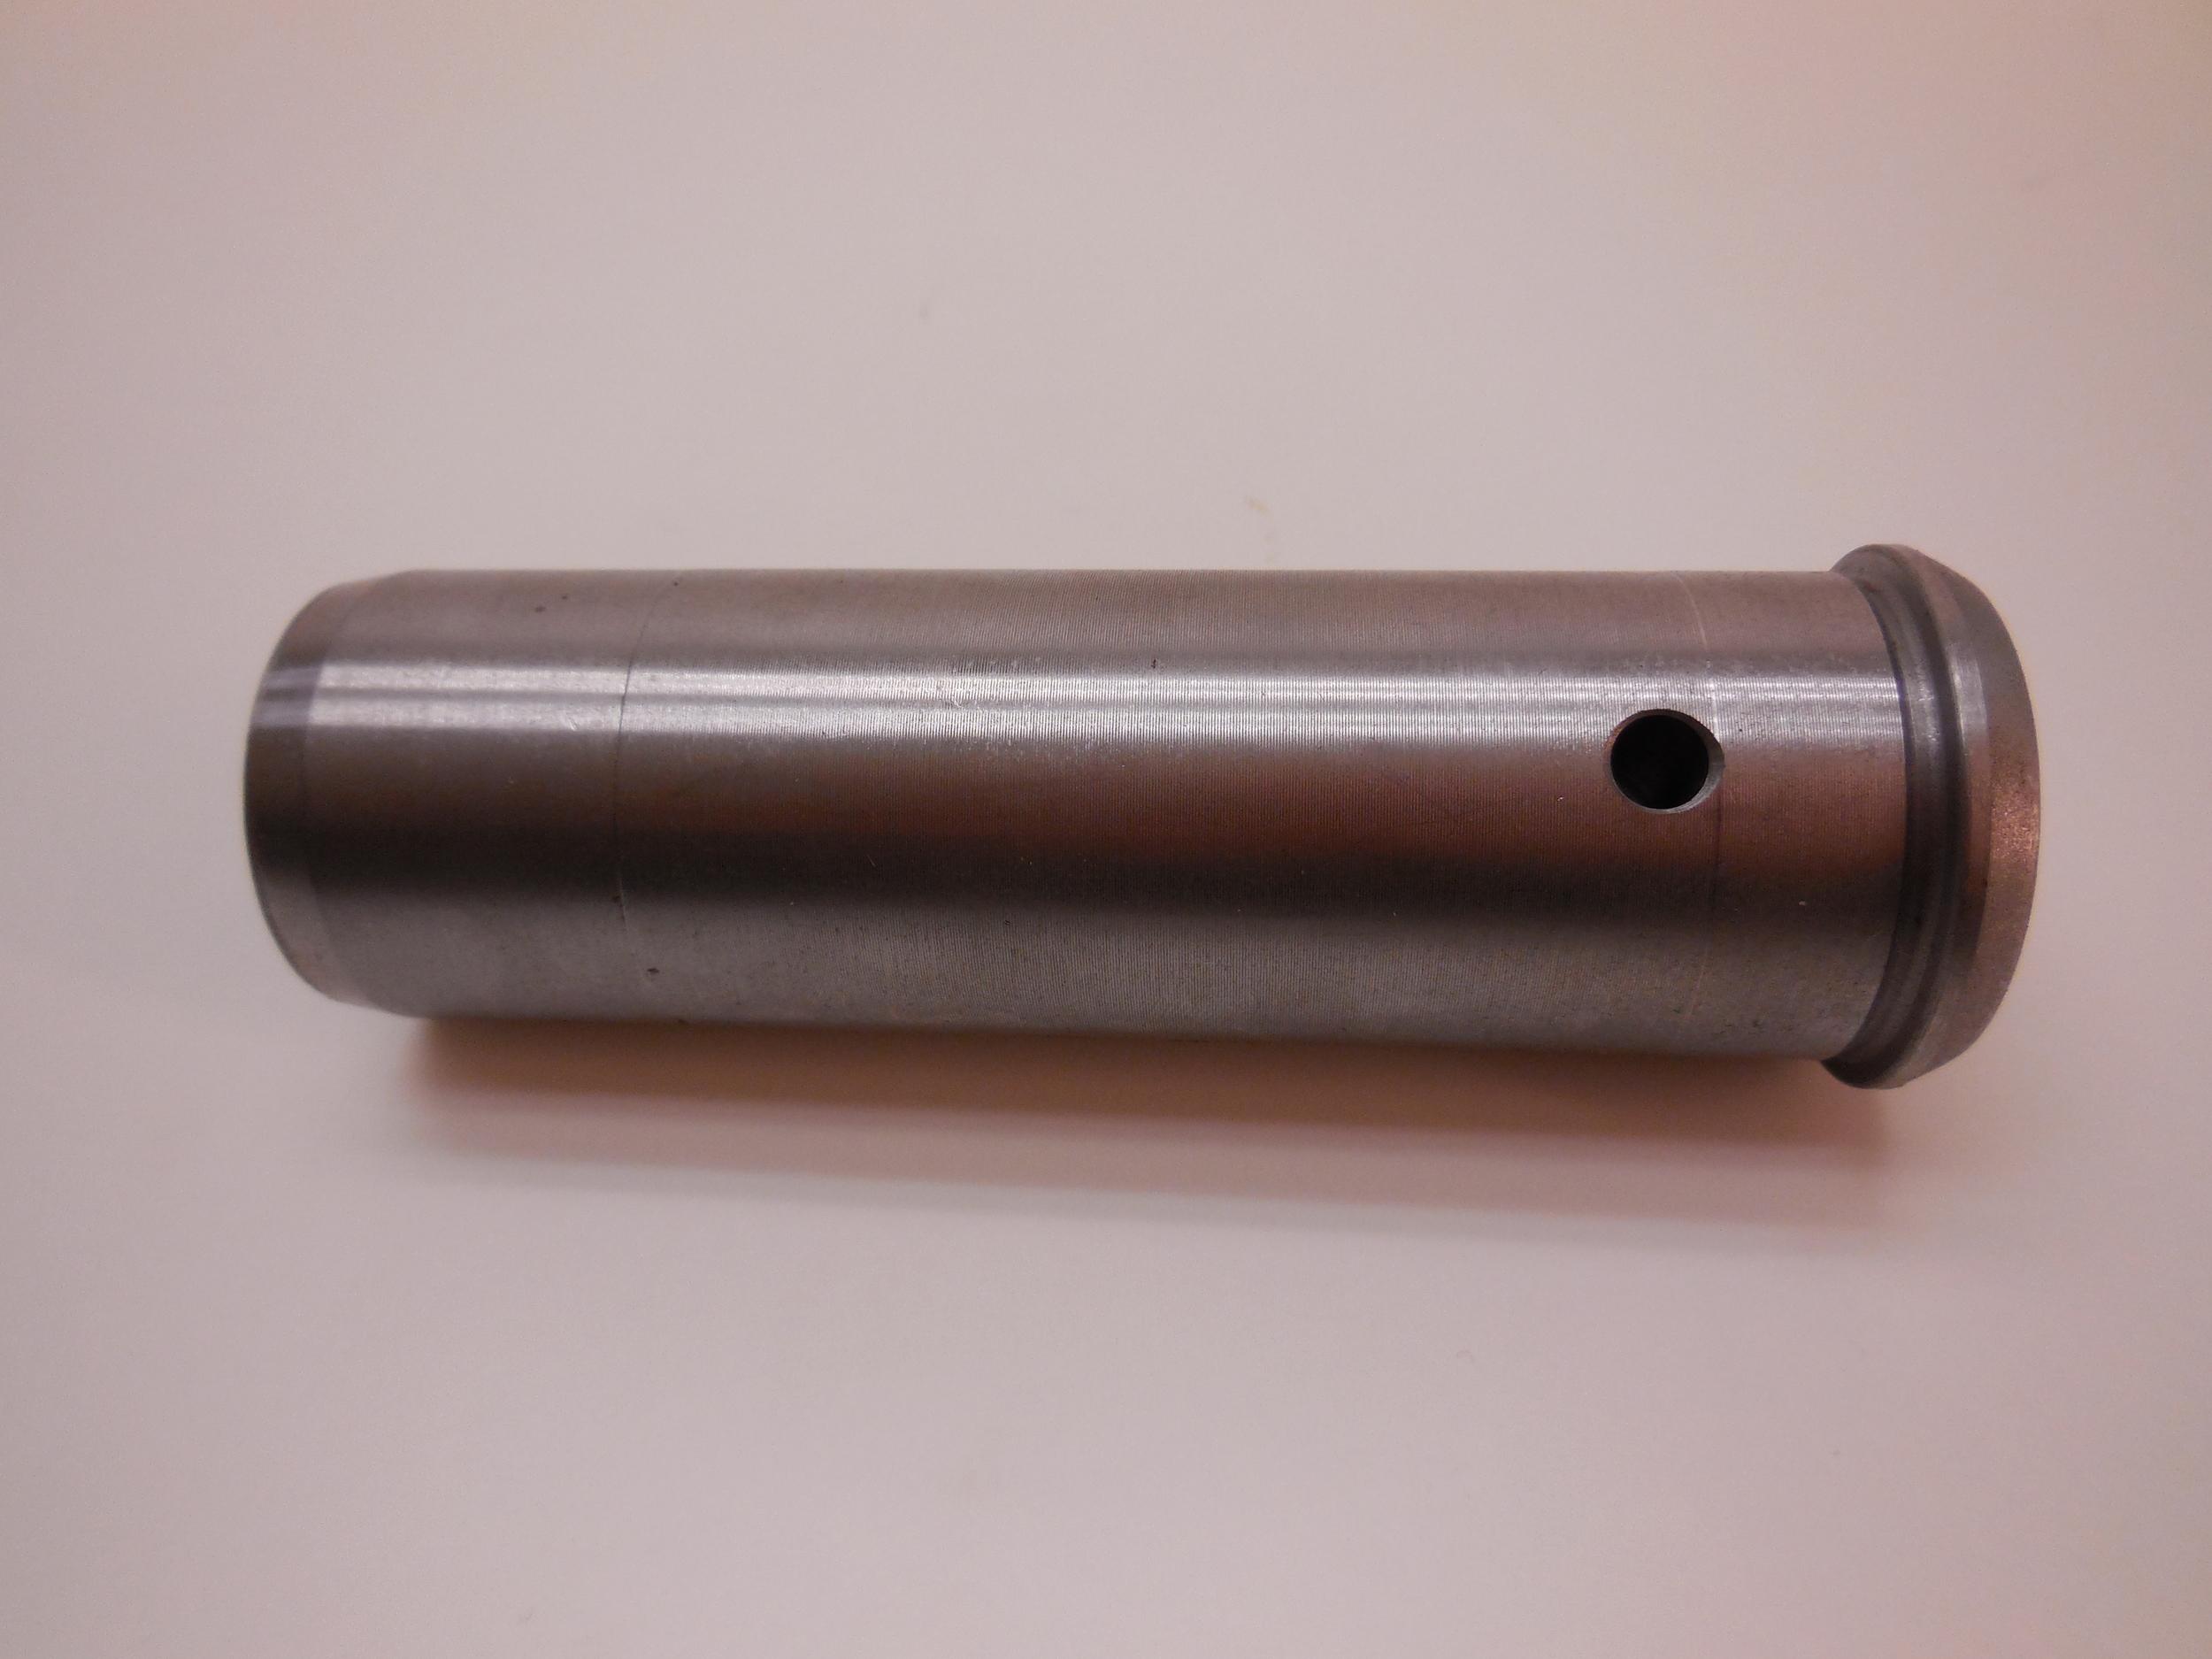 Steering Cylinder Pin häggo Nr: 453 6372-001 price: 350 sek